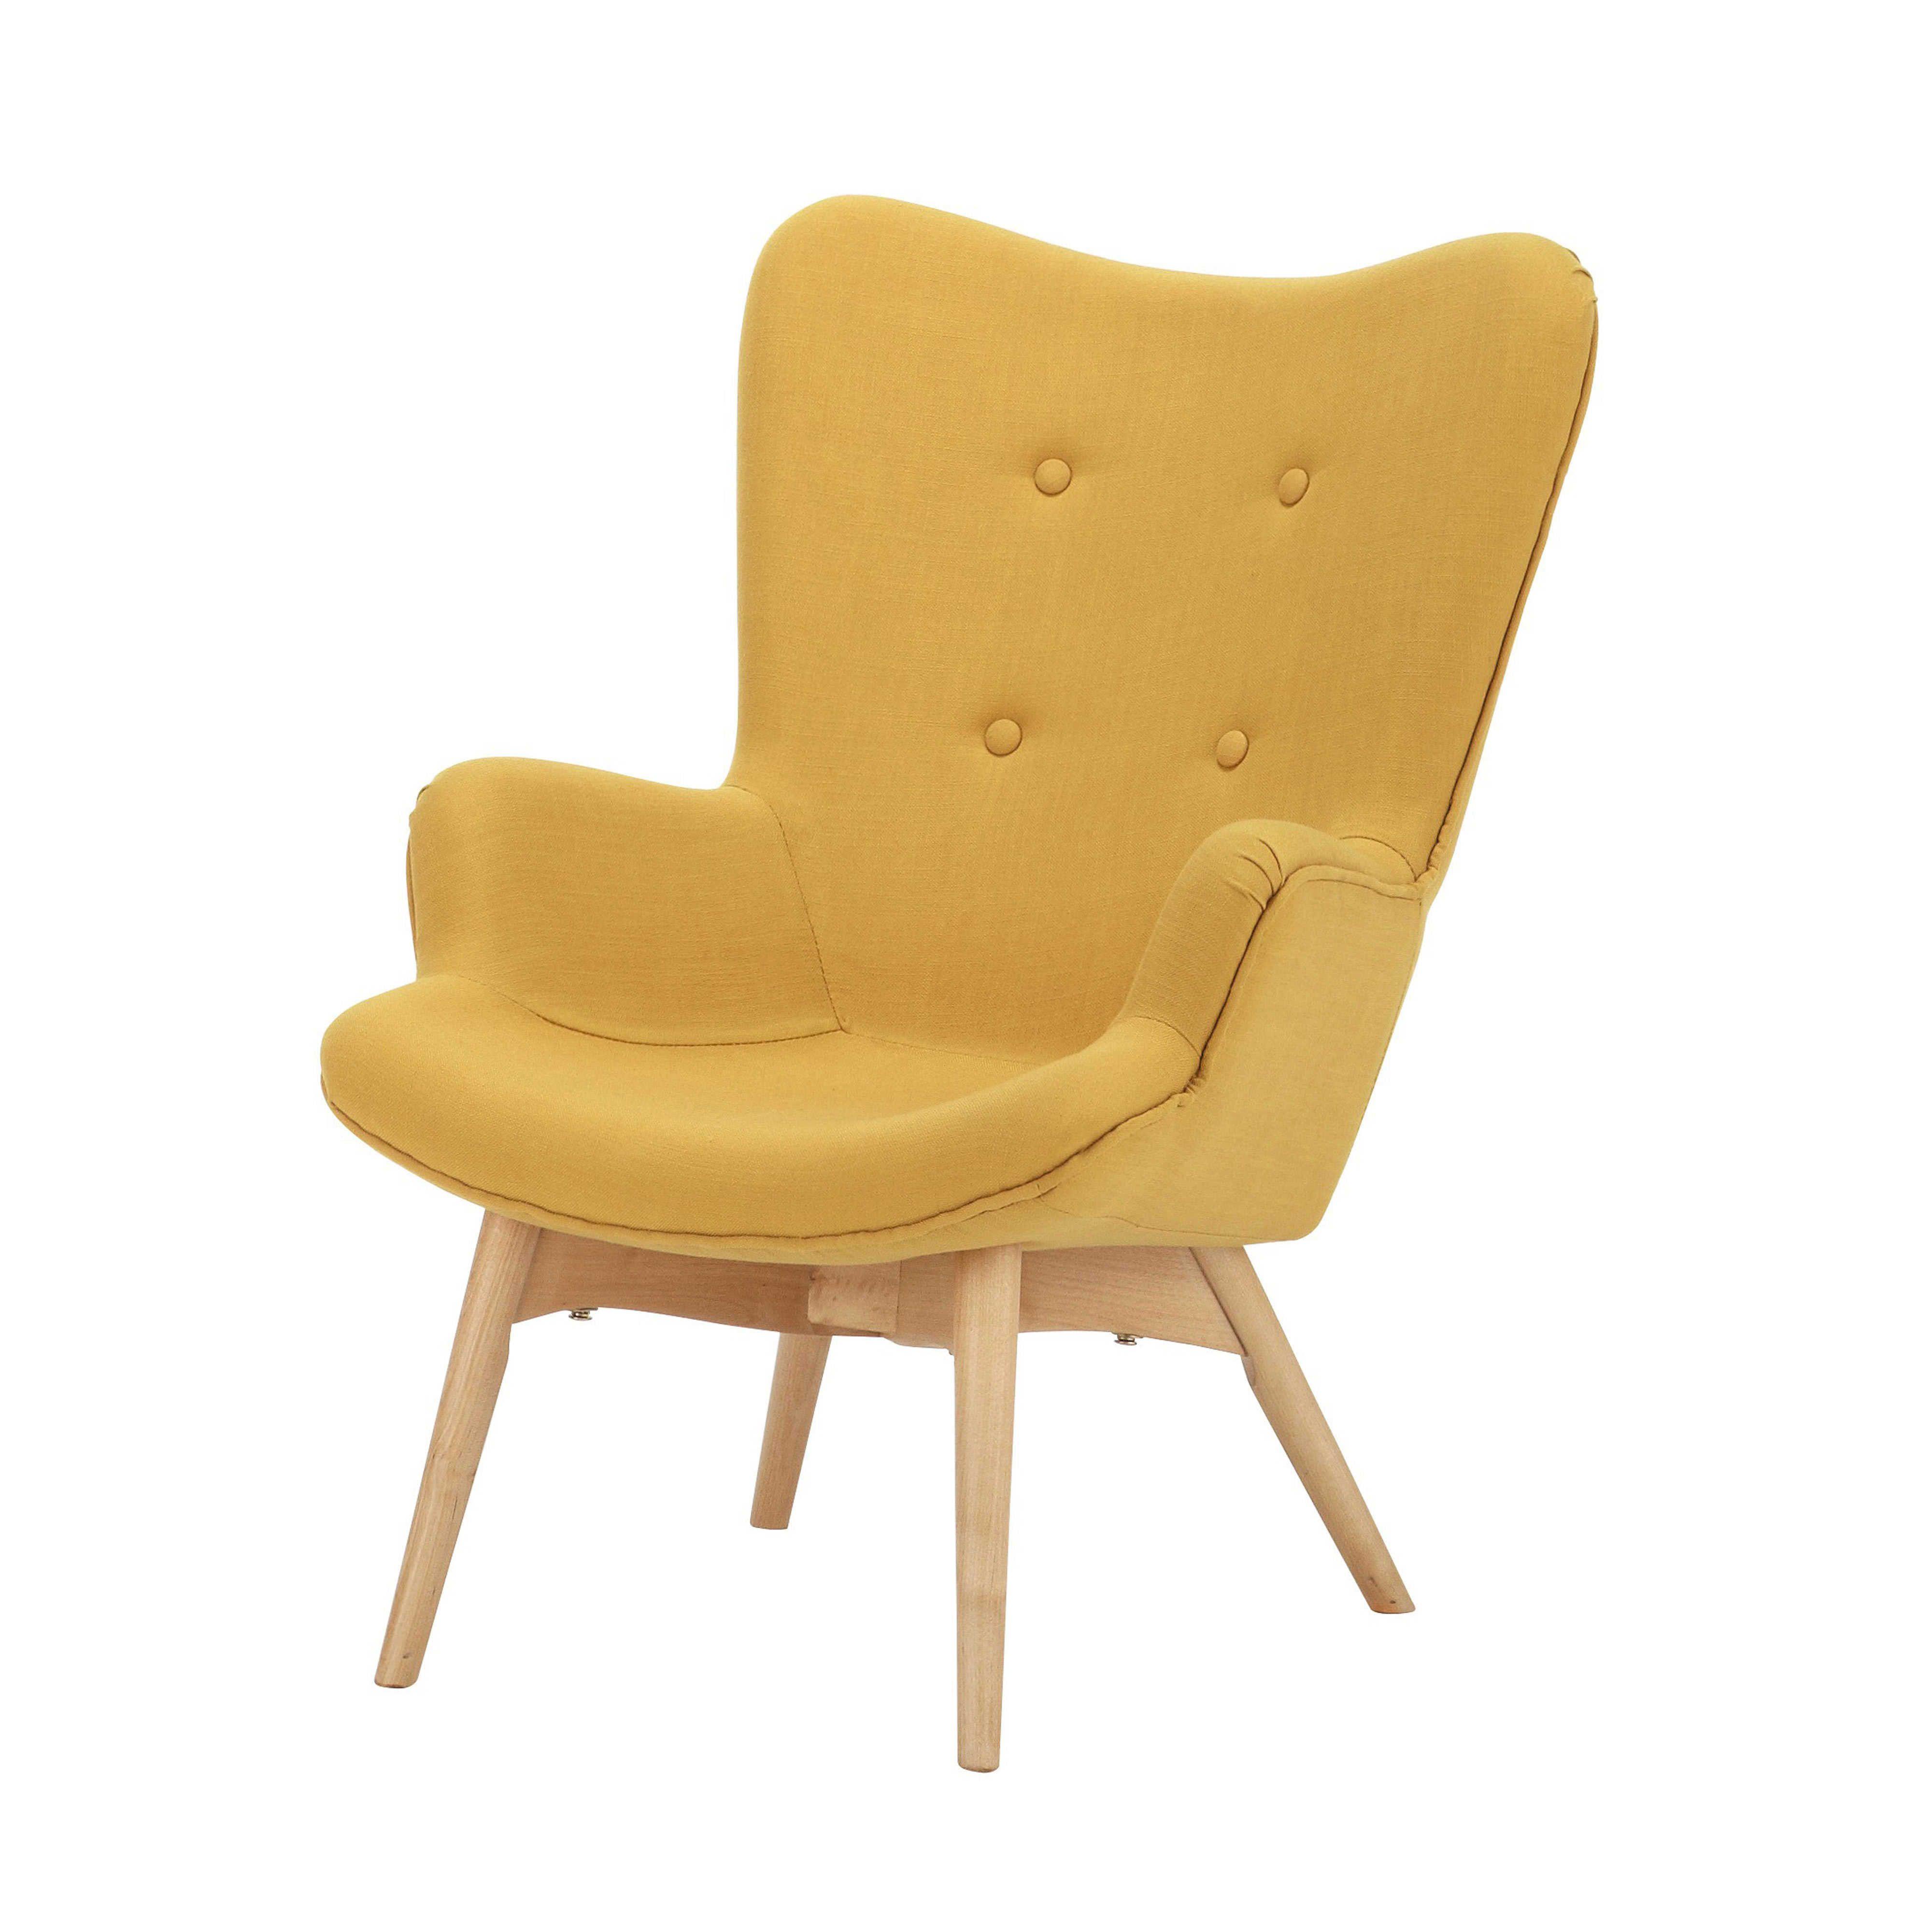 Kindersessel grau  Fauteuil vintage enfant en bois et tissu jaune Iceberg | Kids room ...